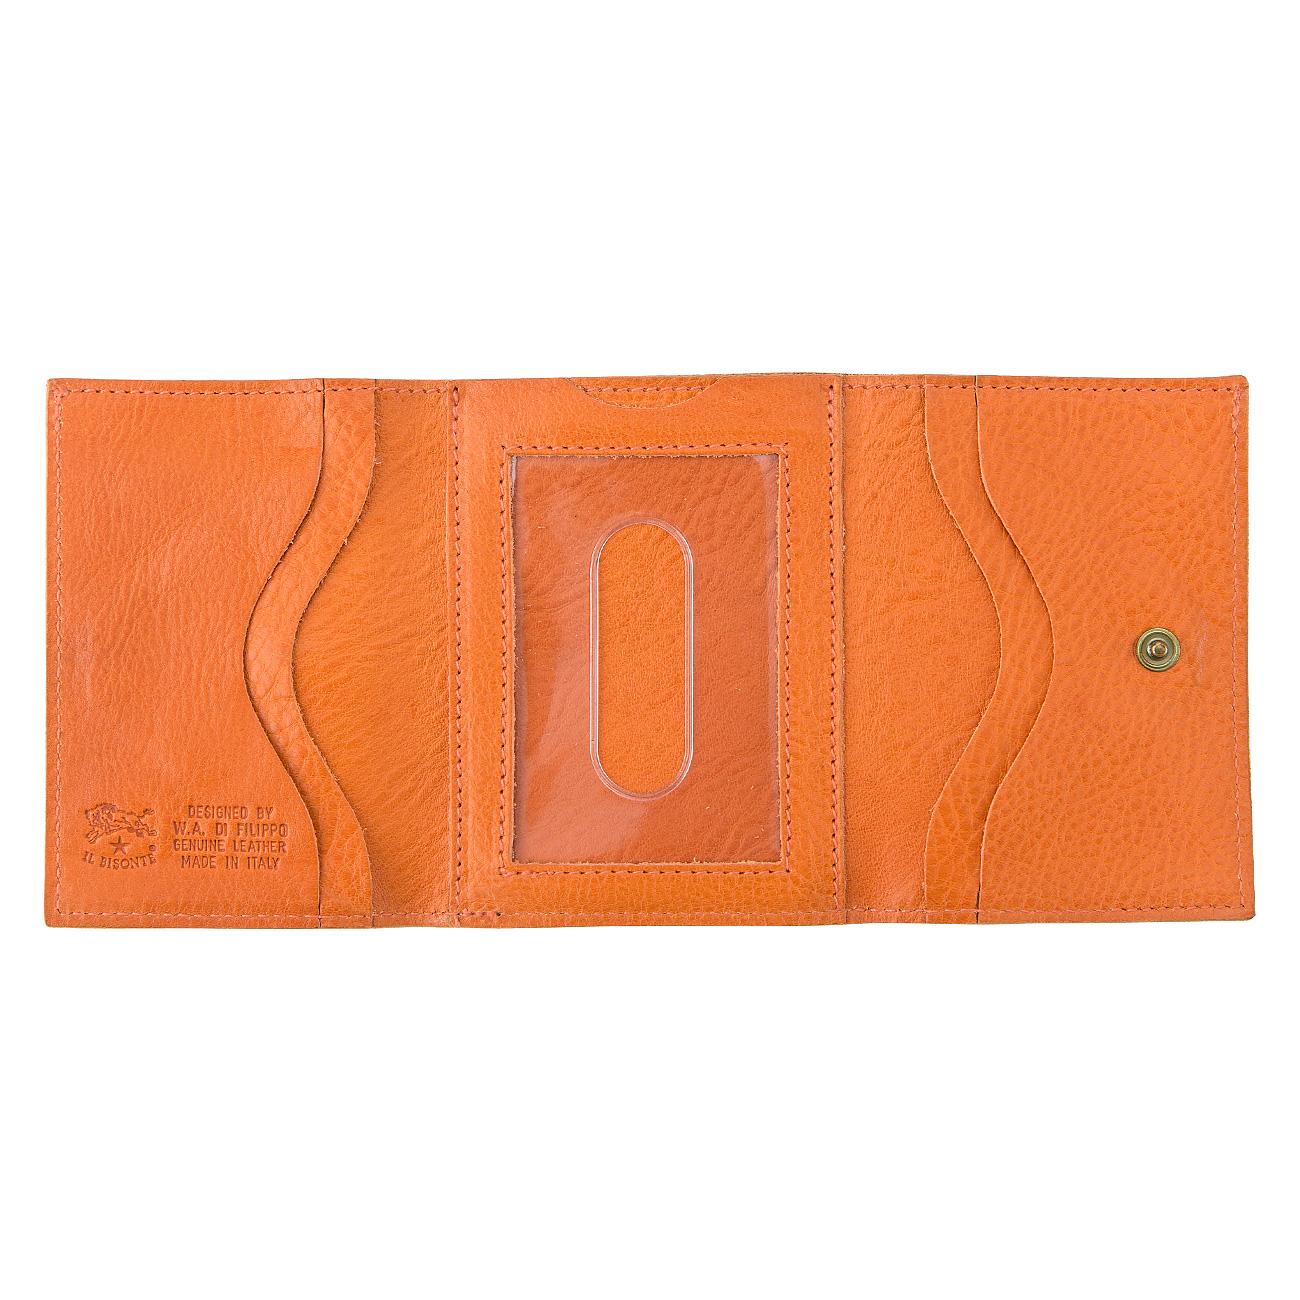 IL BISONTE (イル ビゾンテ) 日本公式オンラインストア 二つ折り財布 5462305240